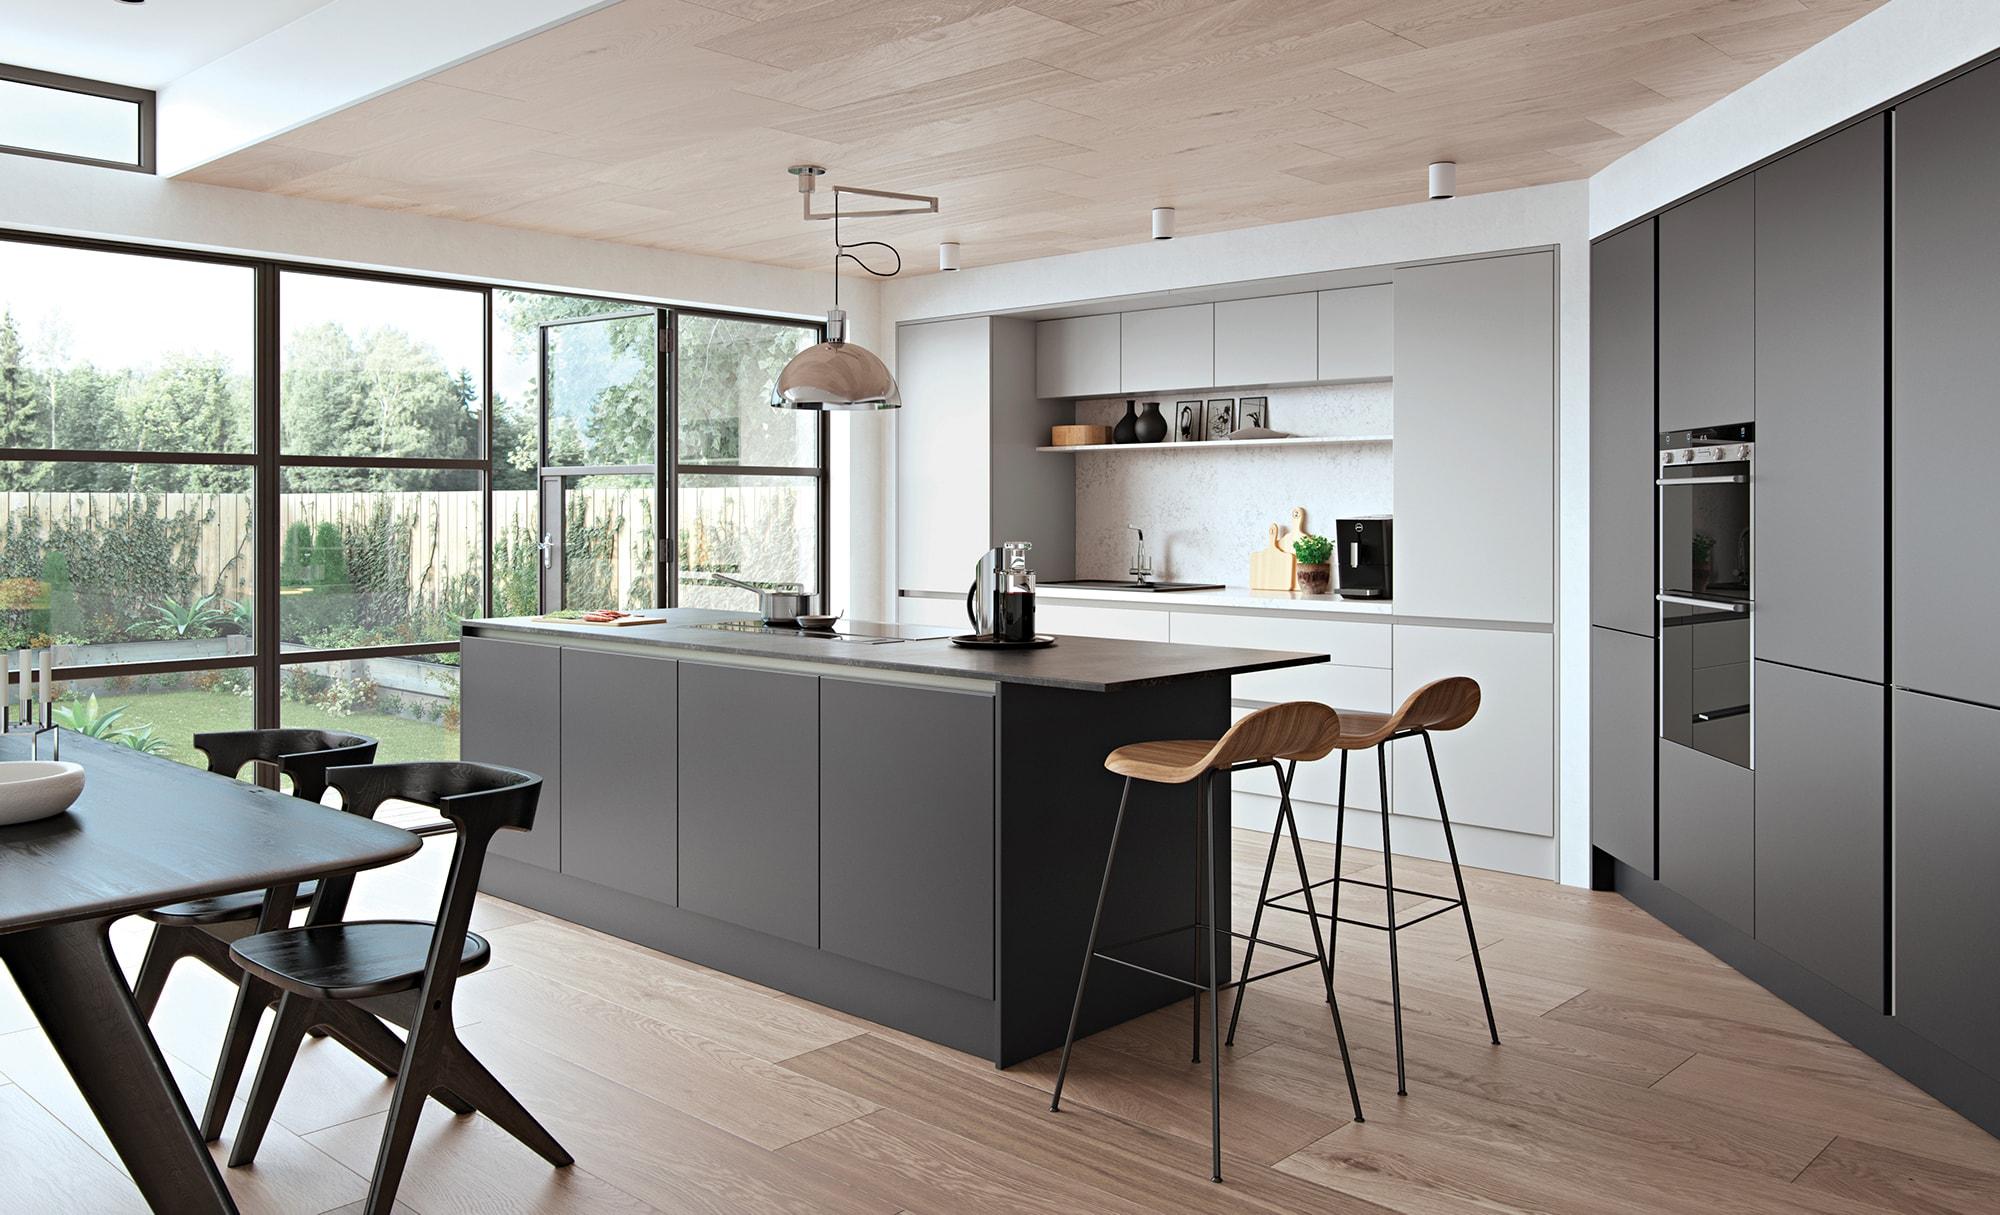 Home - Armada Kitchens & Bathrooms on Modern Kitchen  id=95387